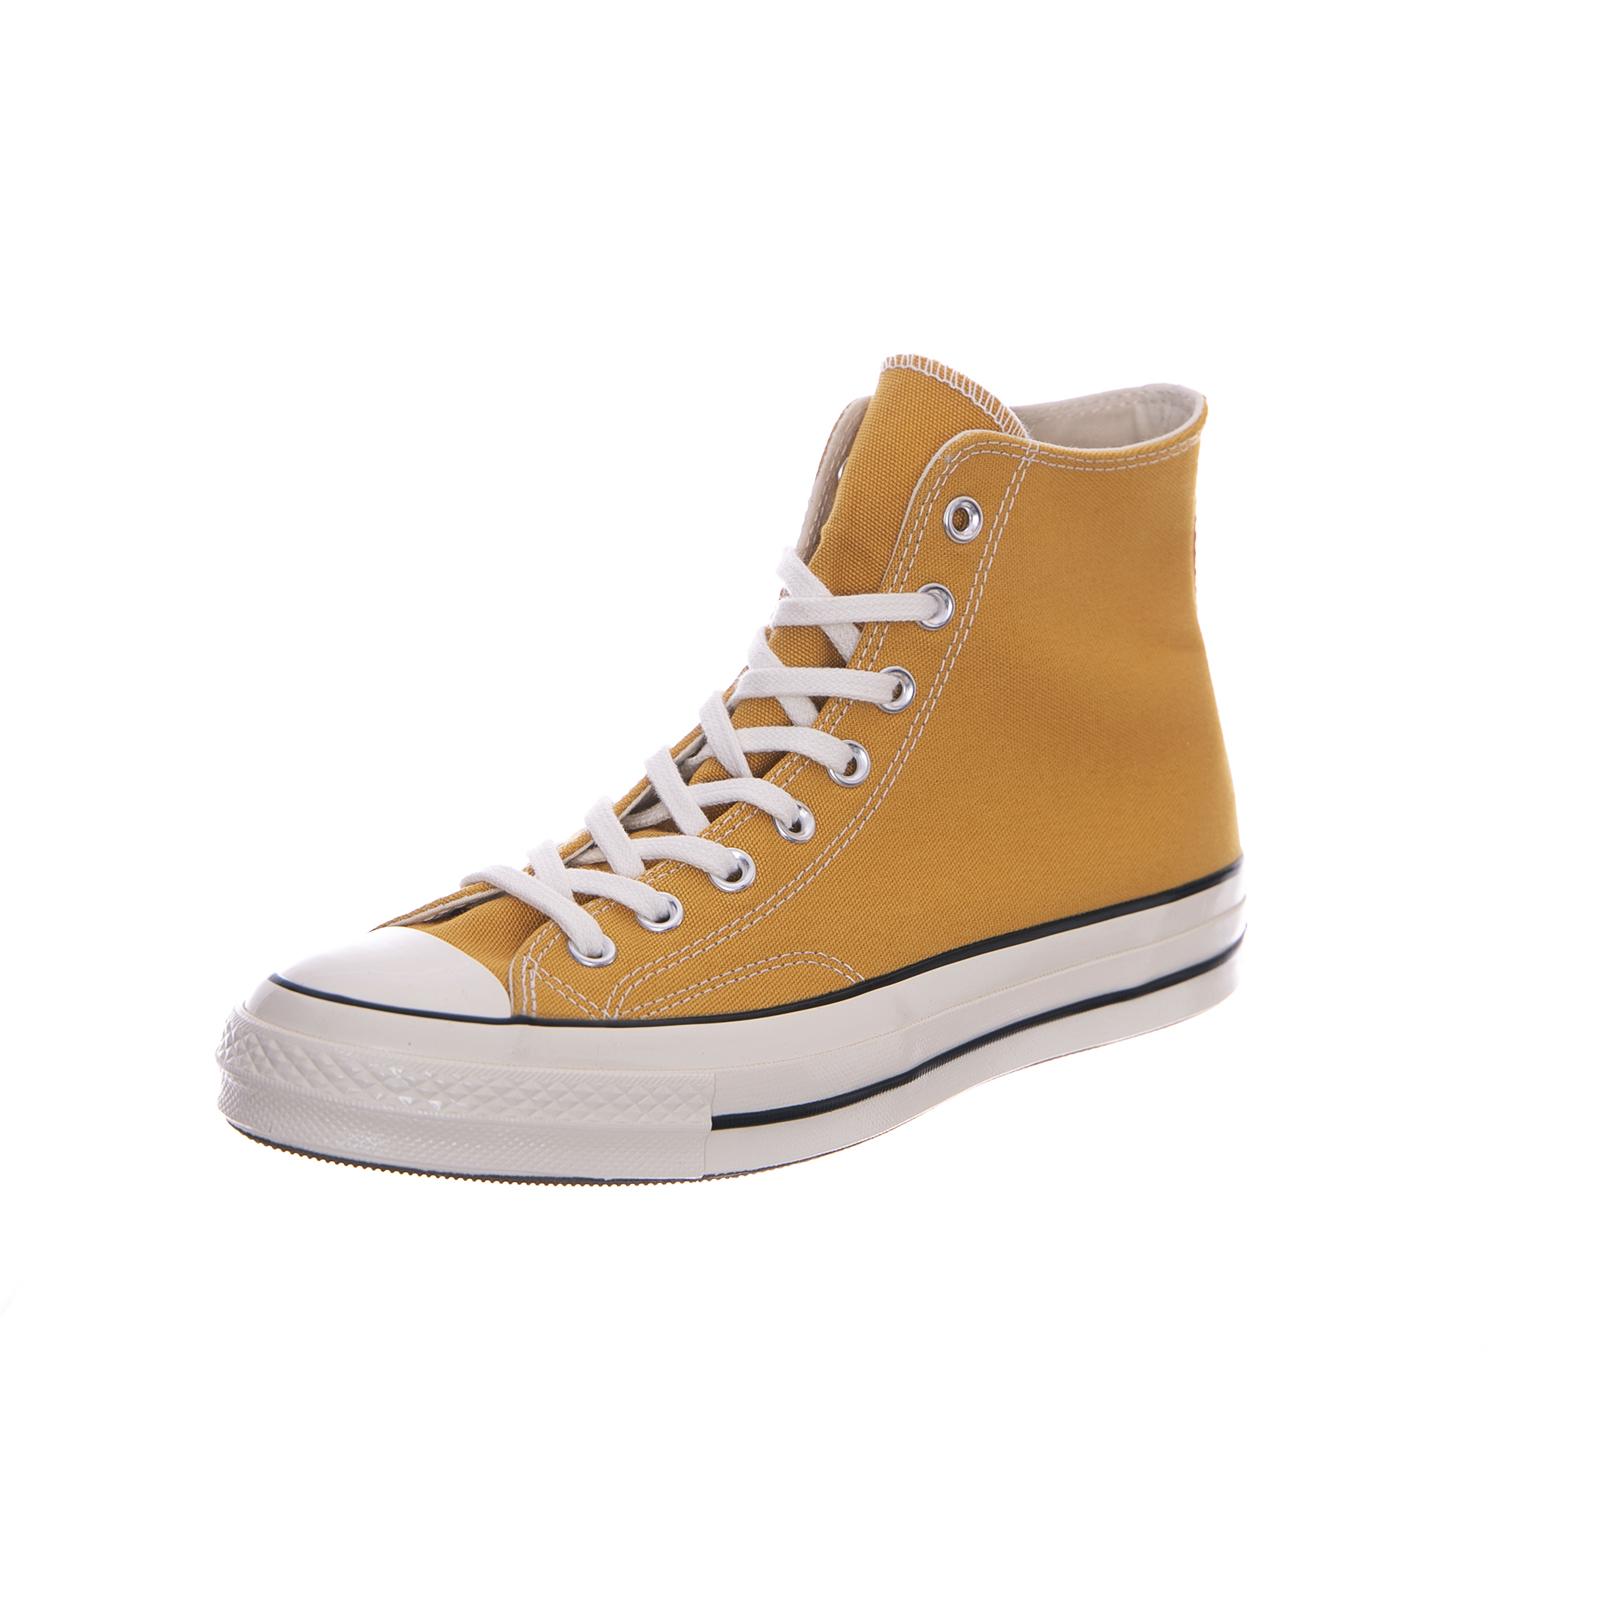 33b546cfc48 Converse sneakers chuck 70 hi vintage canvas sunflower black egret arancione